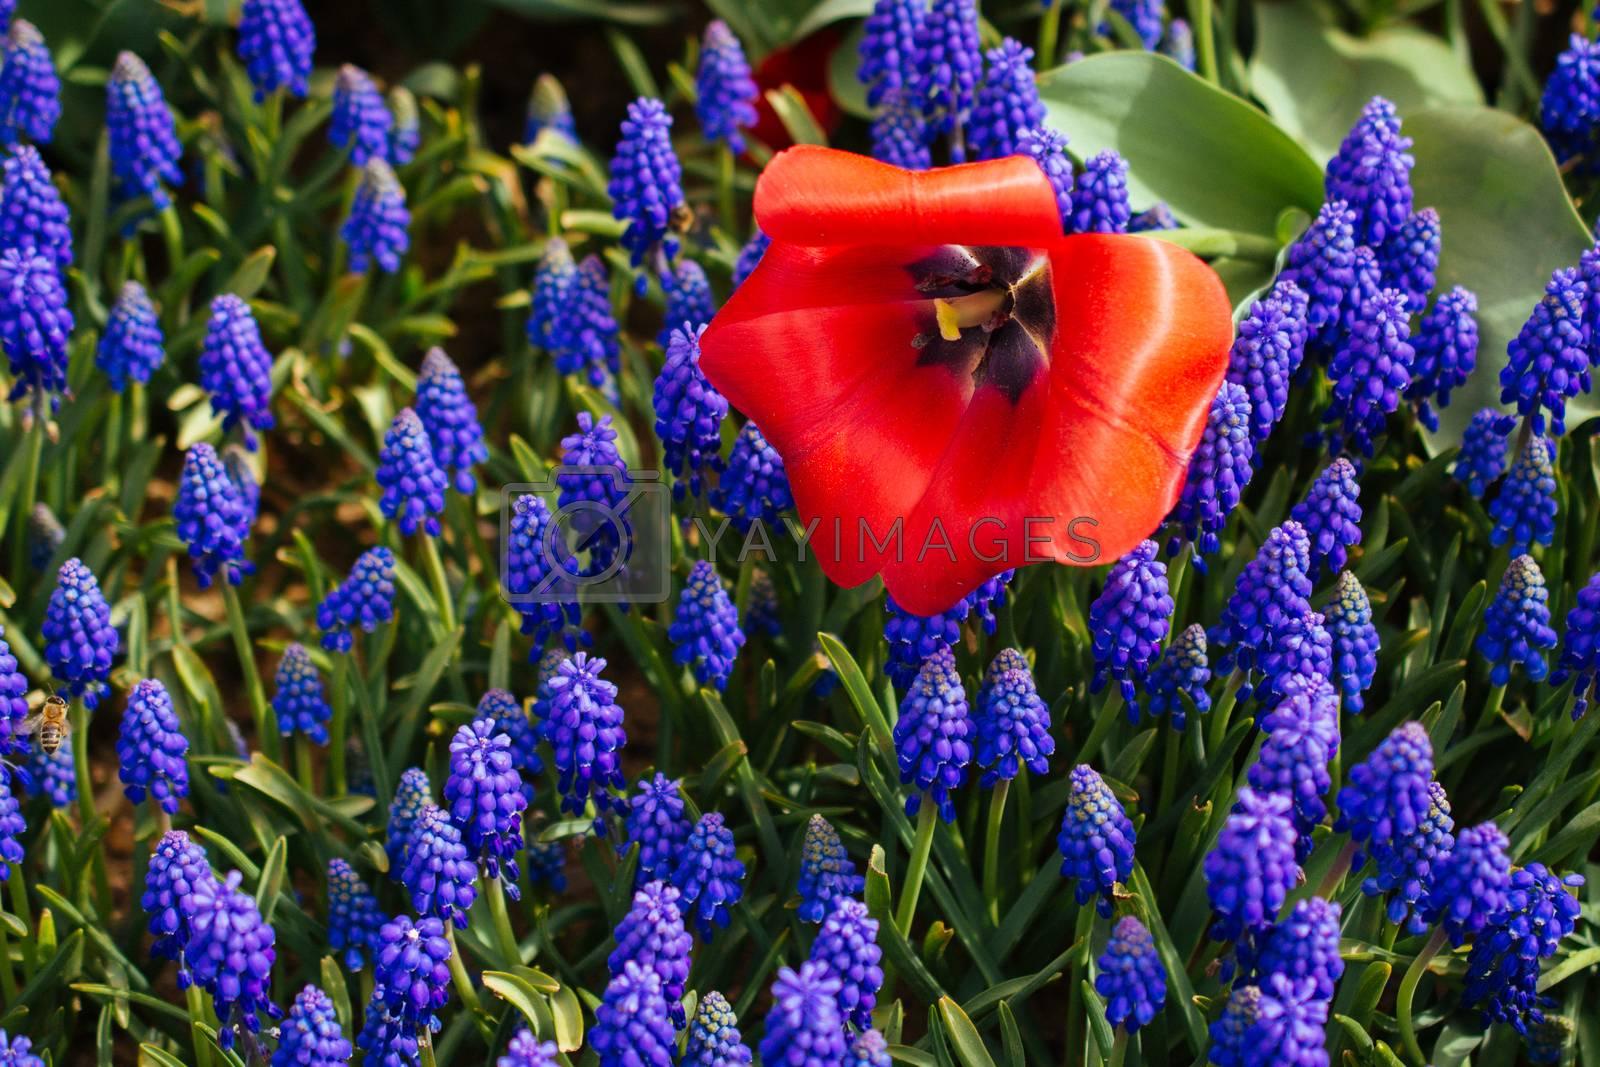 Colorful tulip flower bloom in the garden by berkay